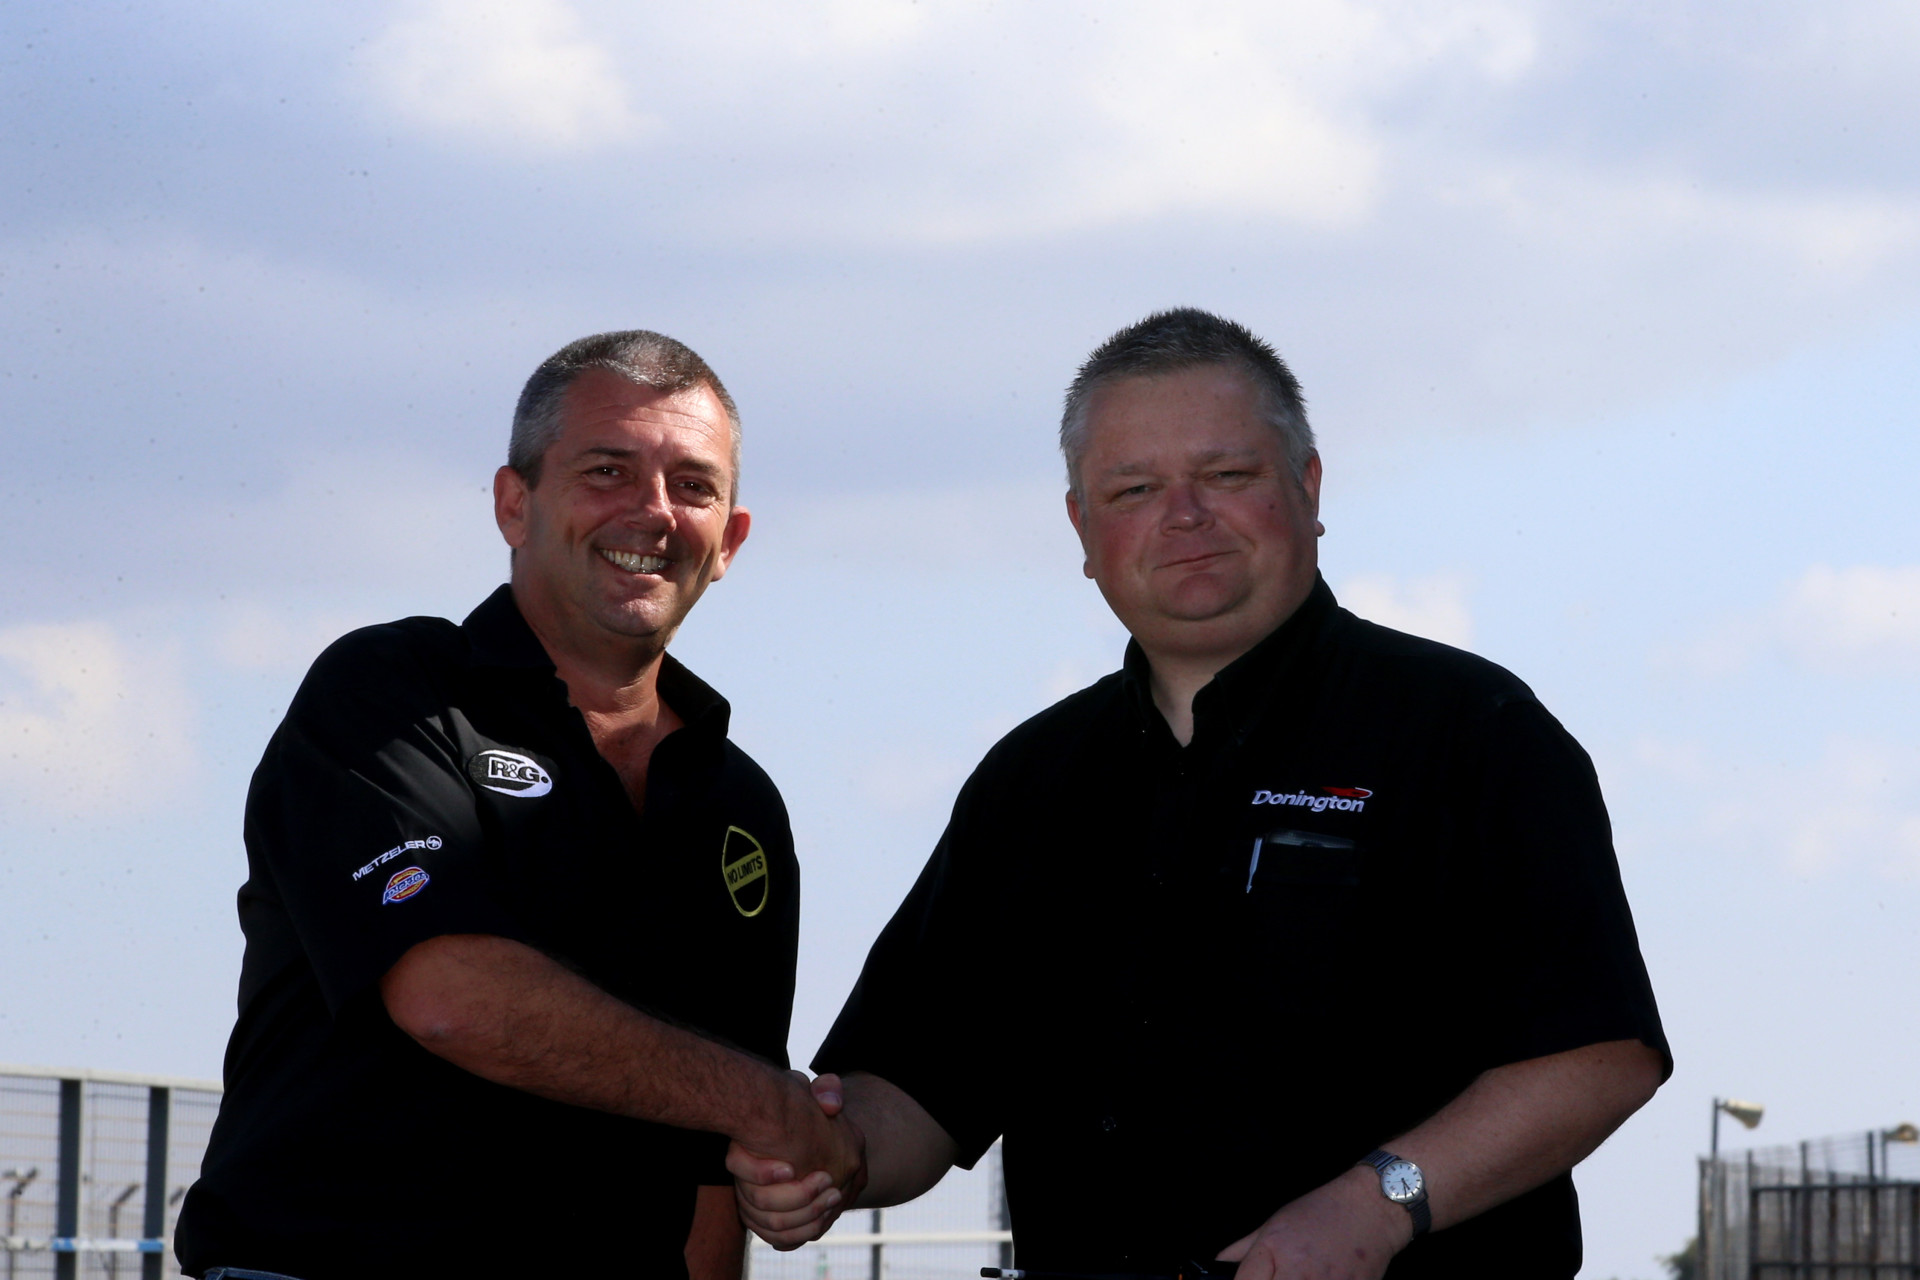 Donington Park to host first UK 1000KM motorcycle endurance race